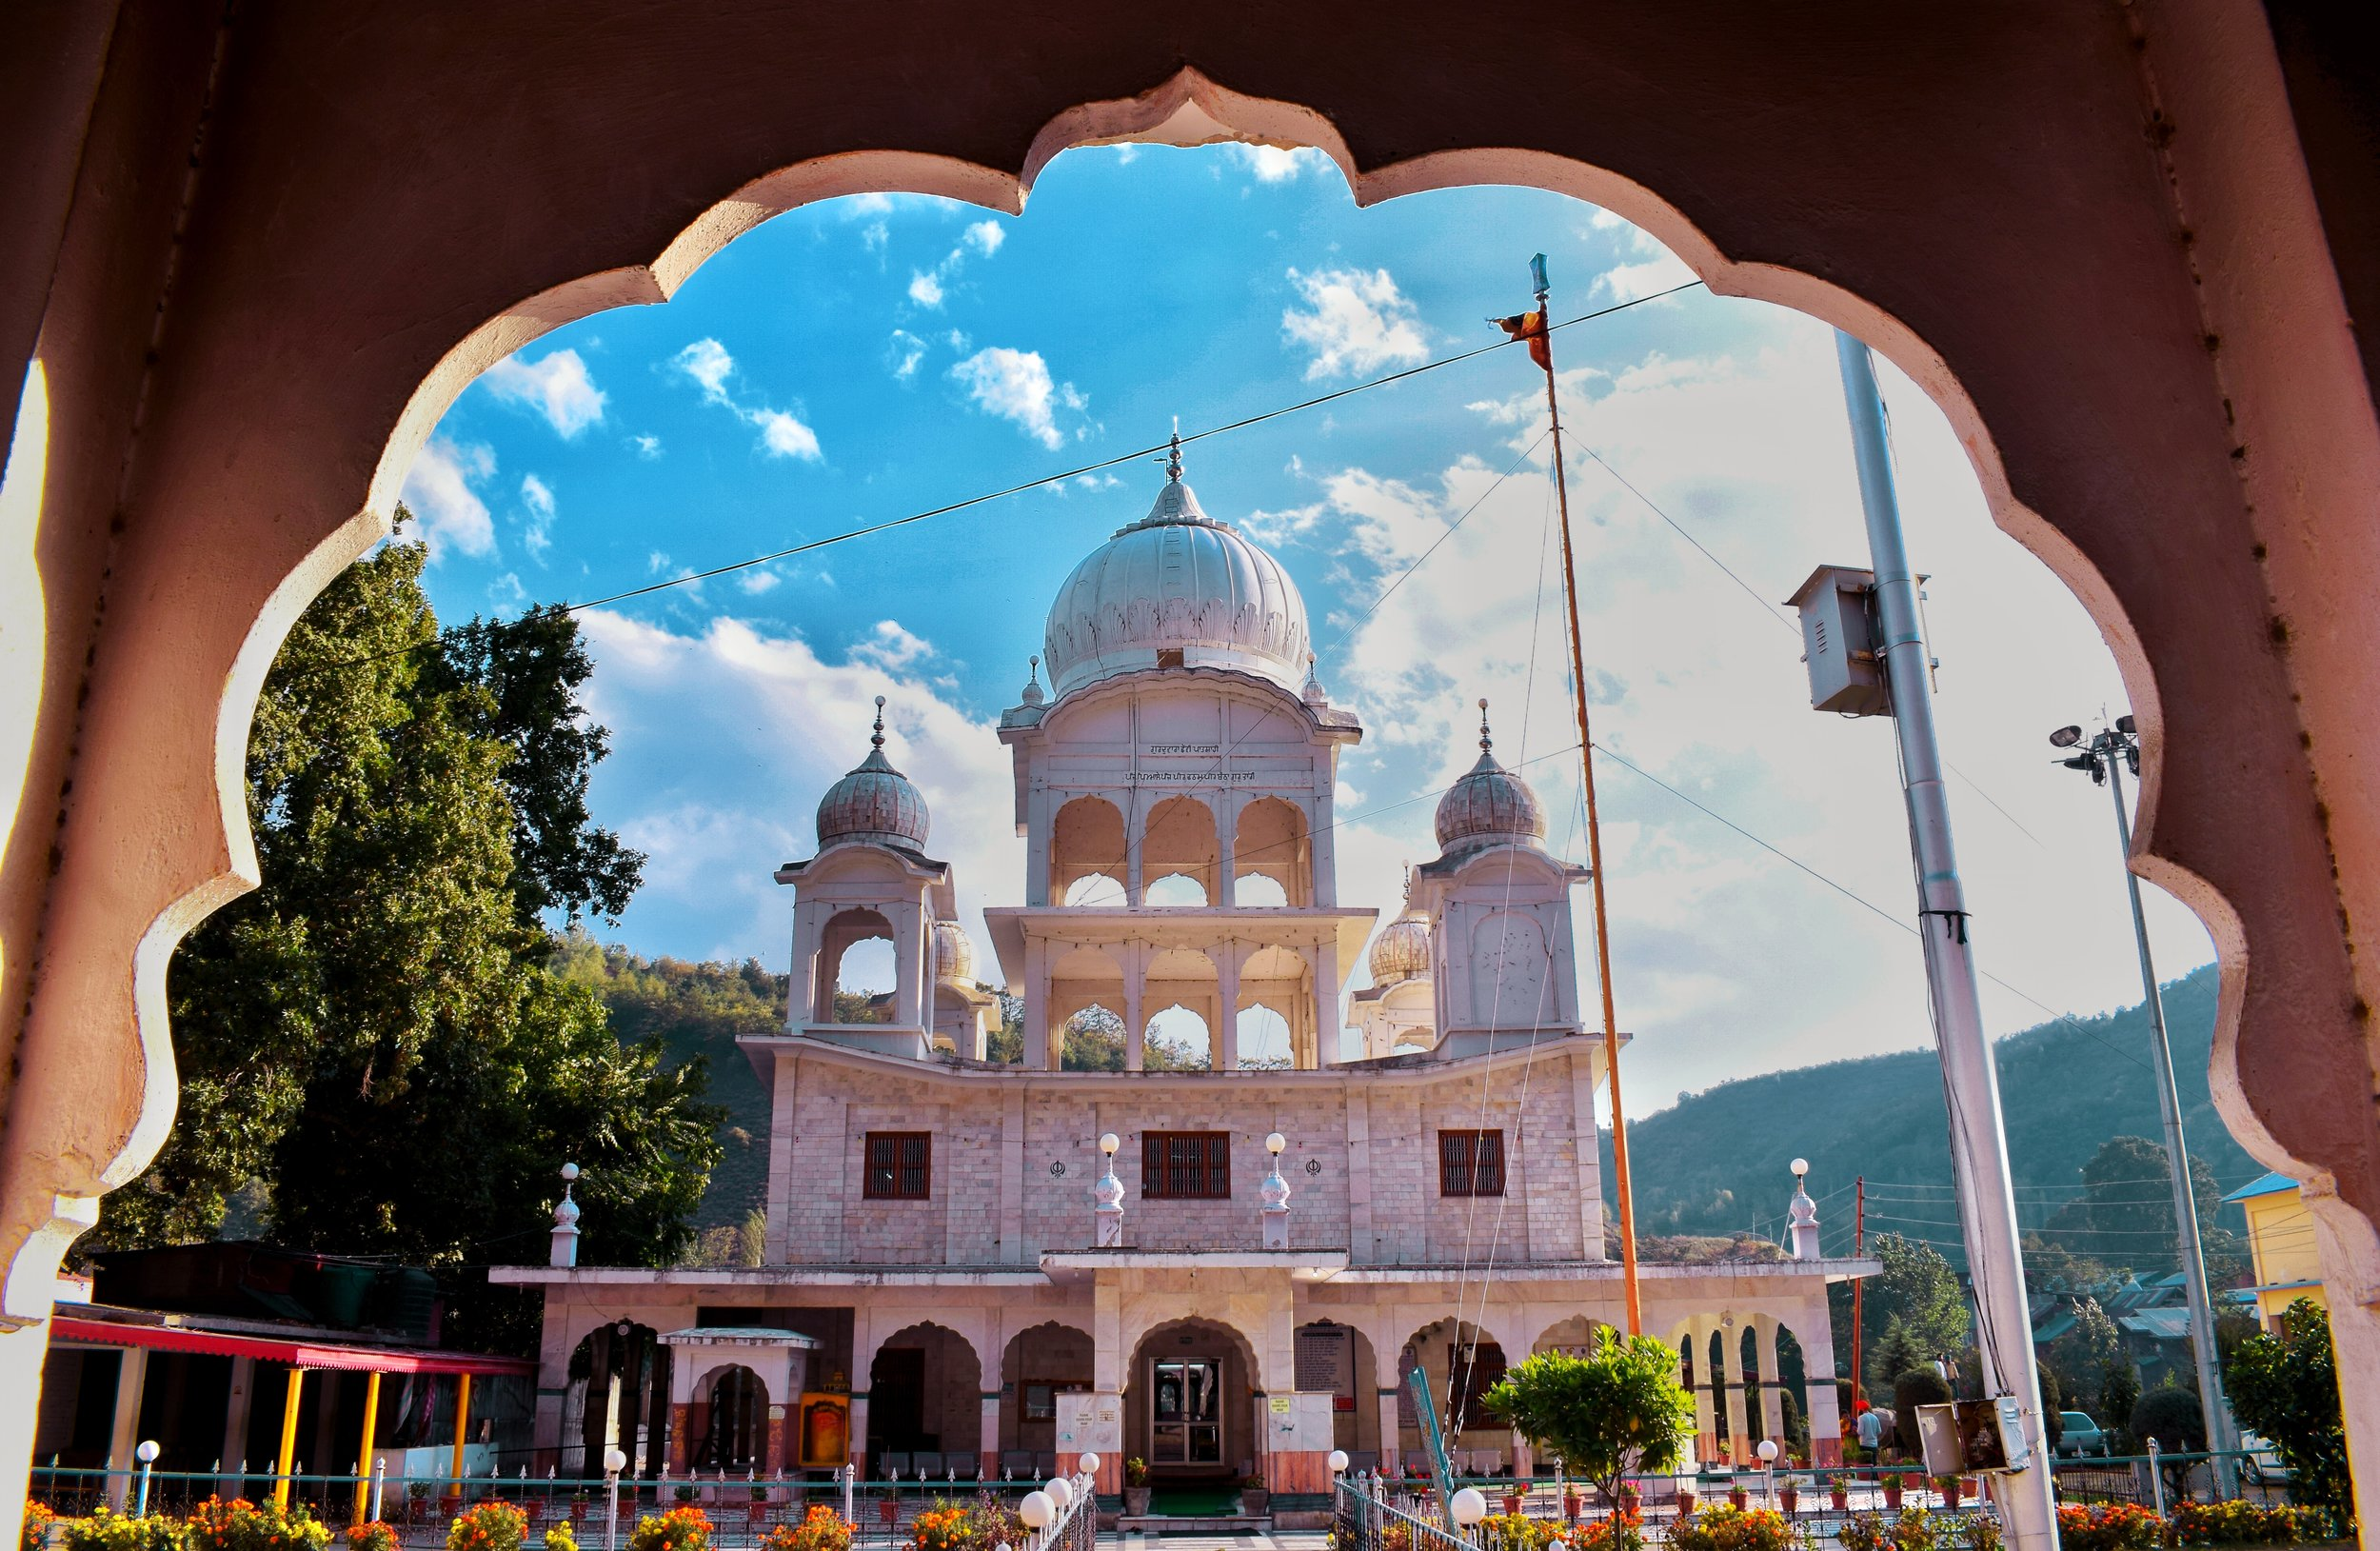 Gurudwara Shri Chatti Patashi Sahib is situated in the hills in Baramulla, Kashmir, on the bank of the river Jhelum. Devoted to Shri Guru Hargobind Singh Ji, thousands of devotes visit the place to offer prayers every year. Photo by Karanjeet Singh.